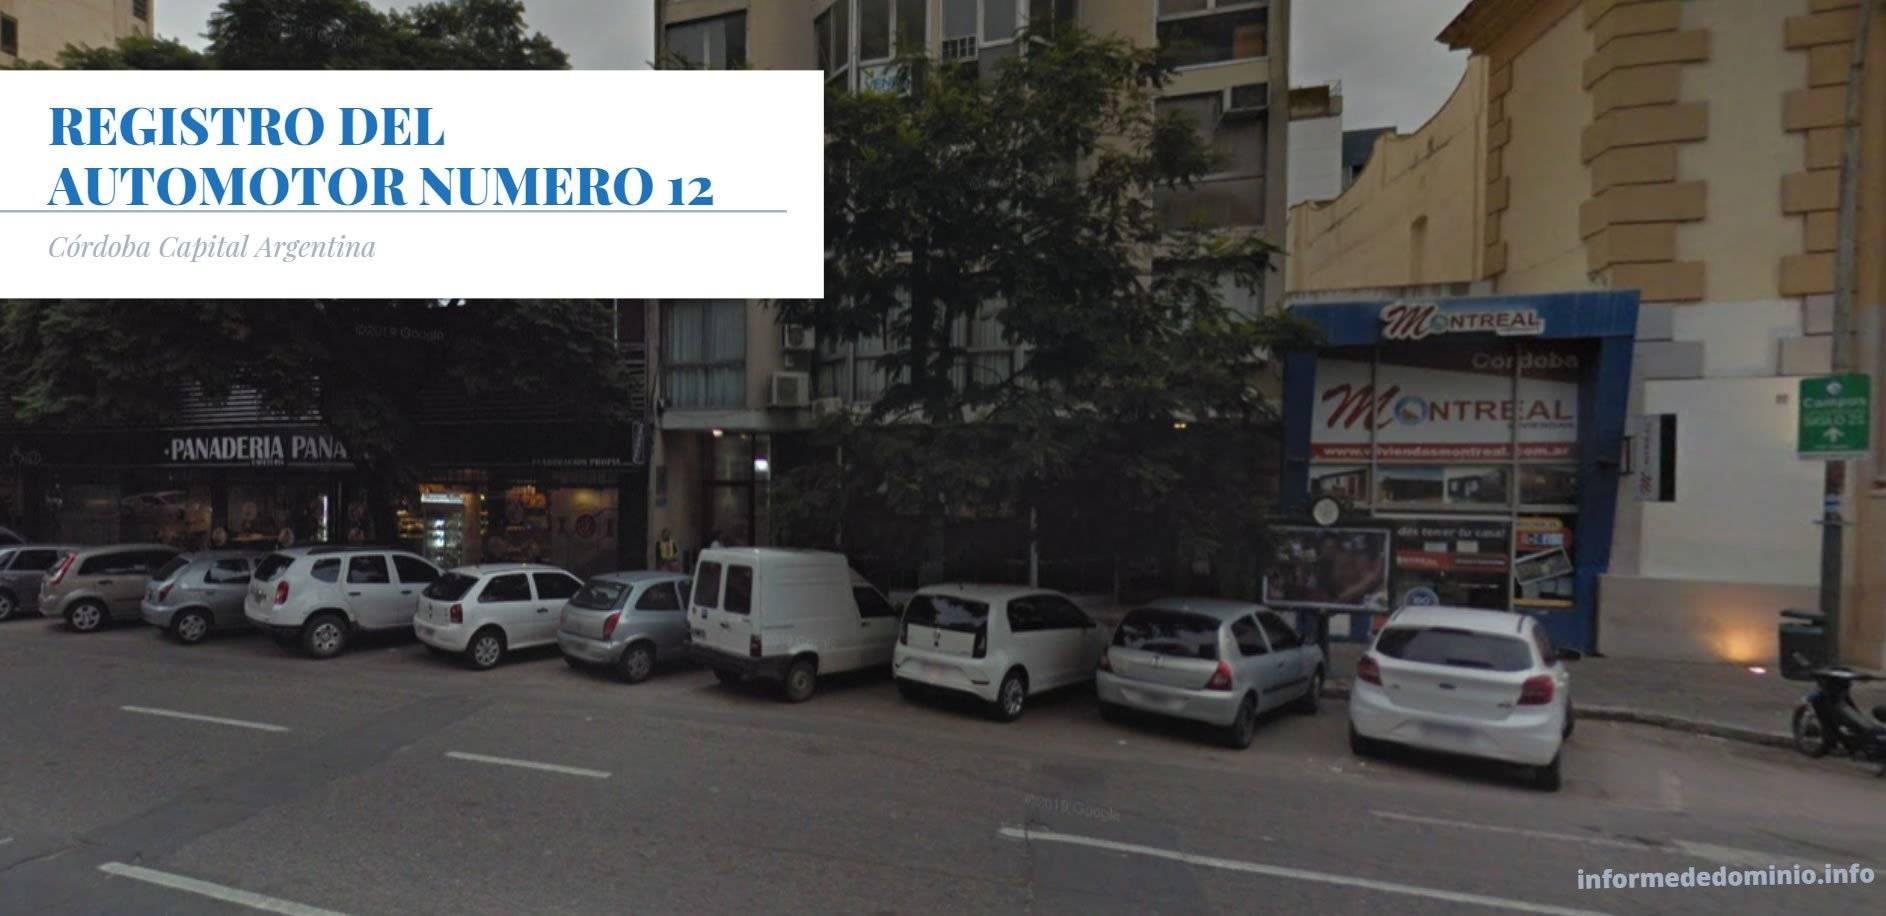 Registro Automotor Número 12 de Cordoba Capital